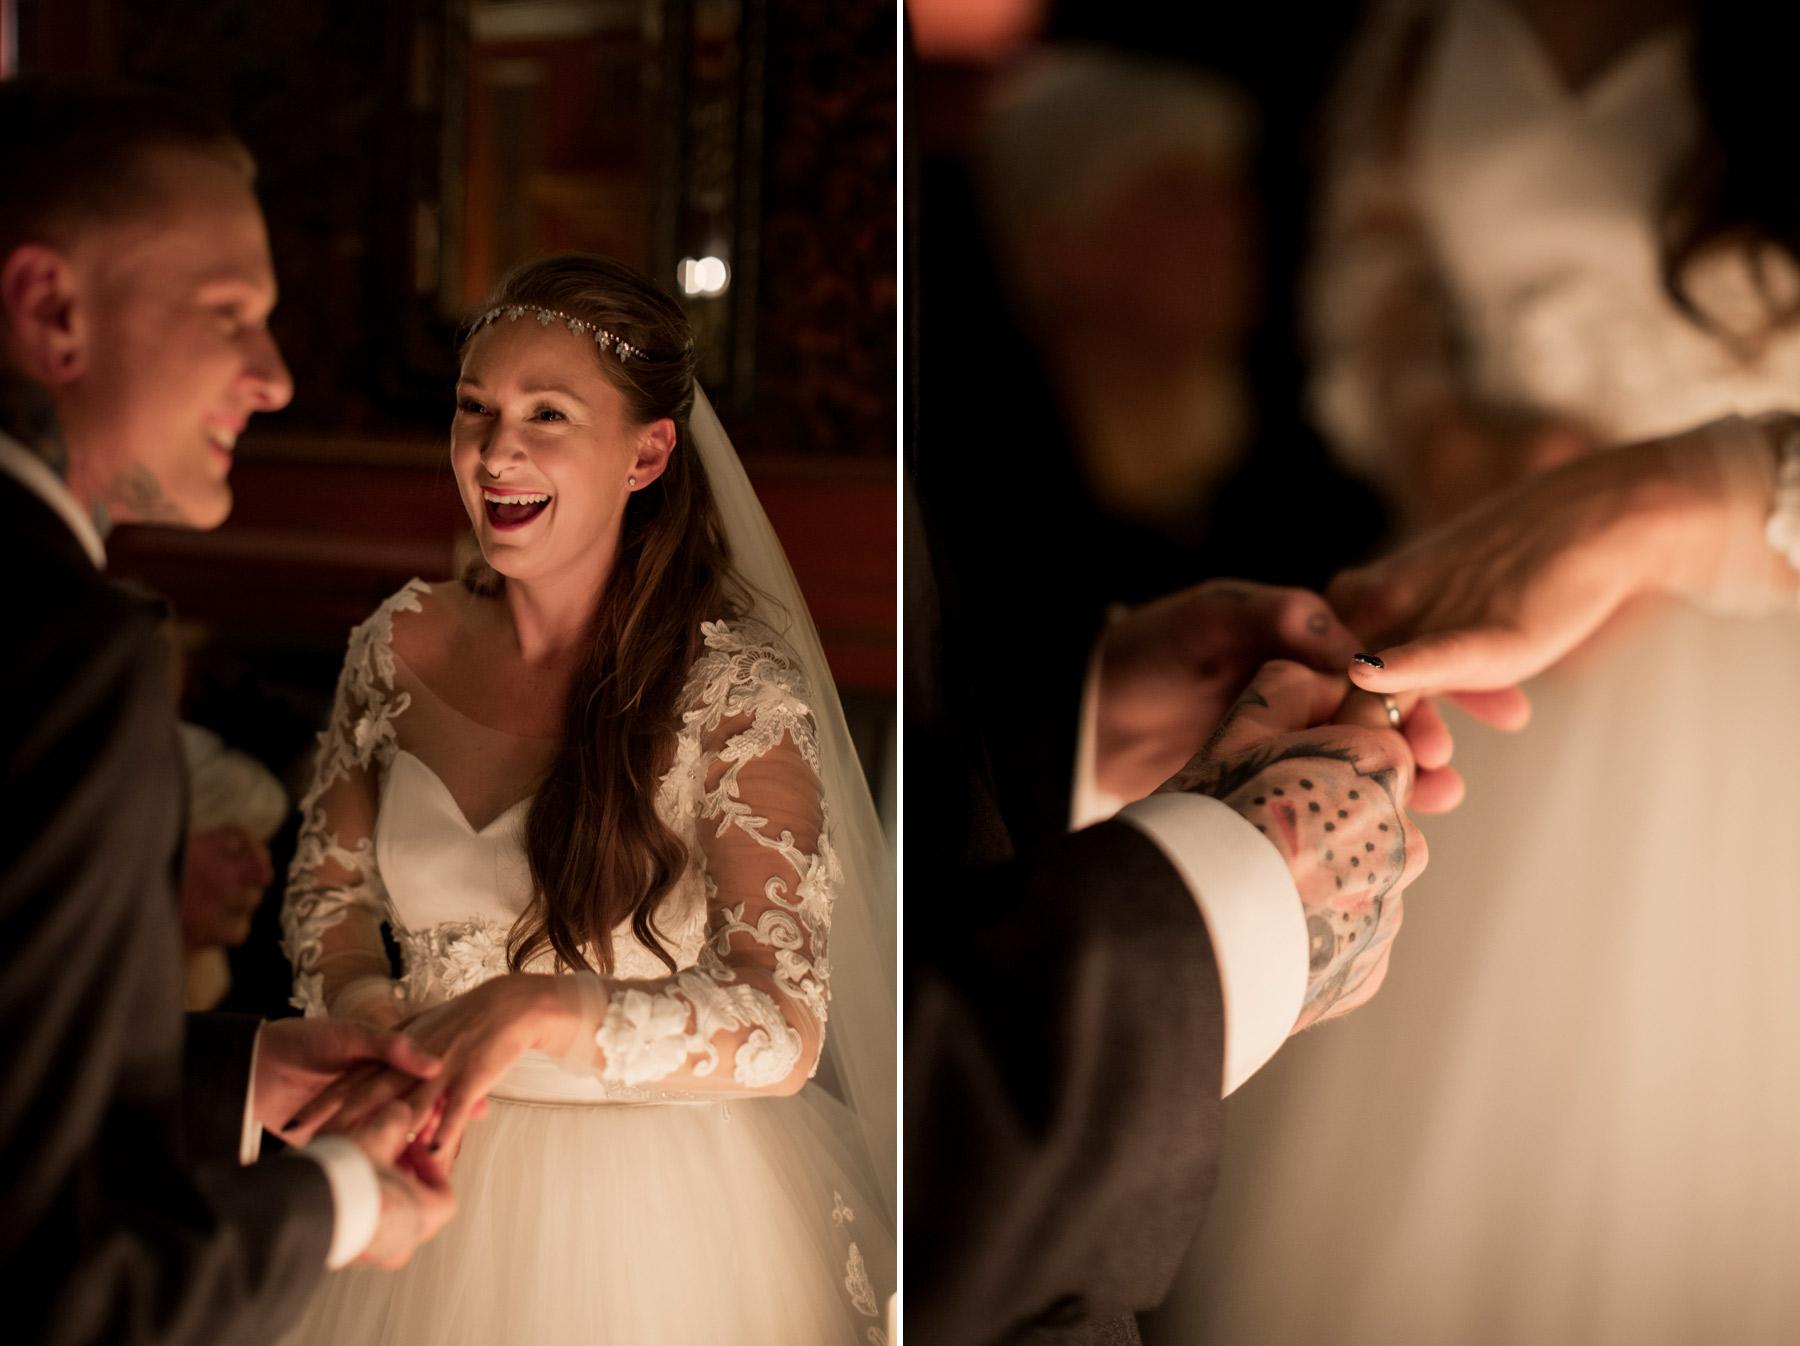 wedding vows at halloween